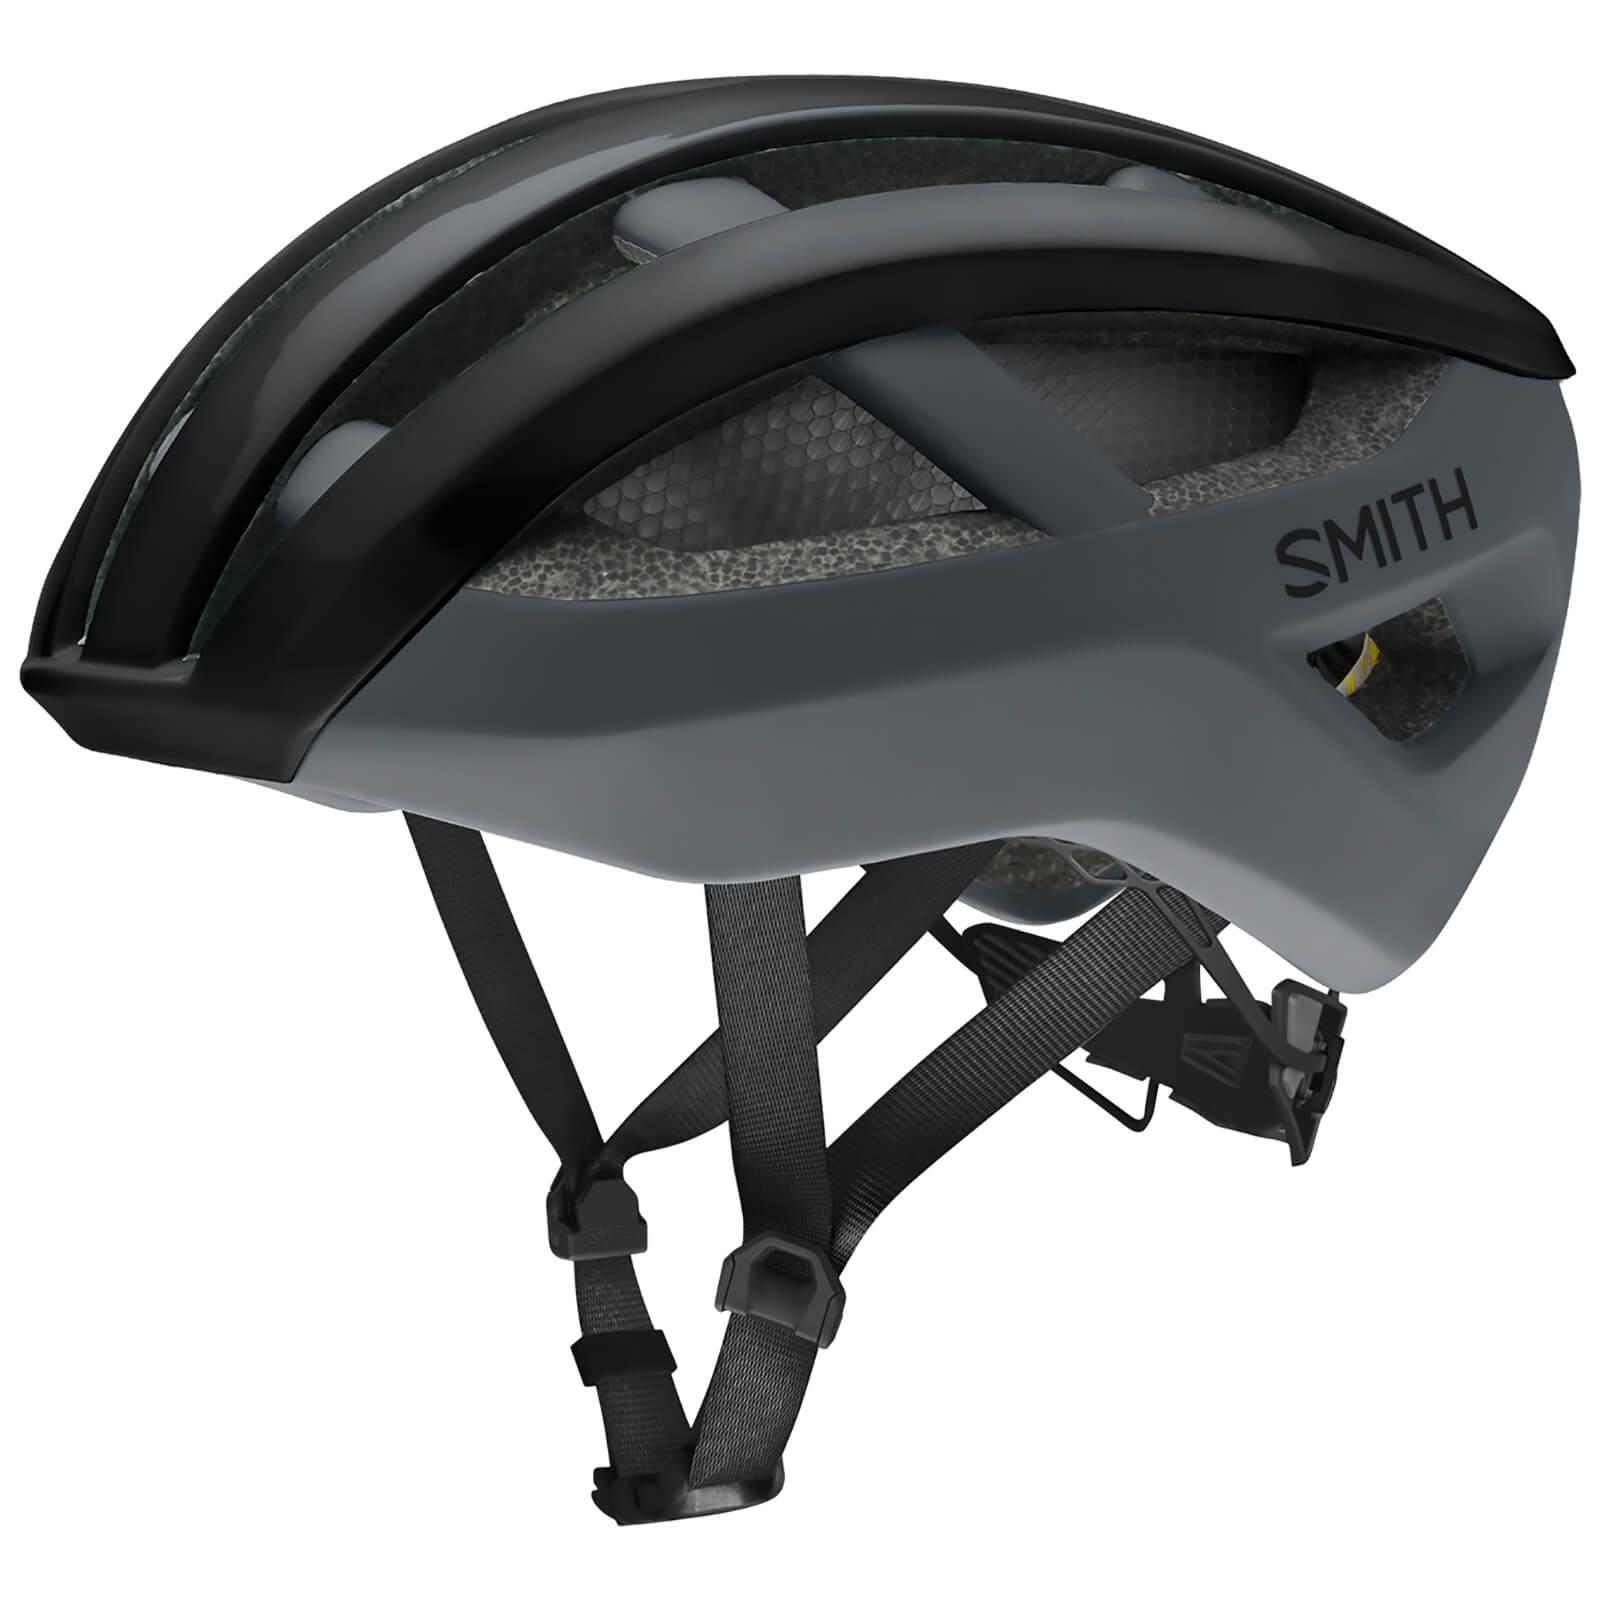 Smith Network MIPS Road Helmet - Small - Black - Matte Cement; unisex